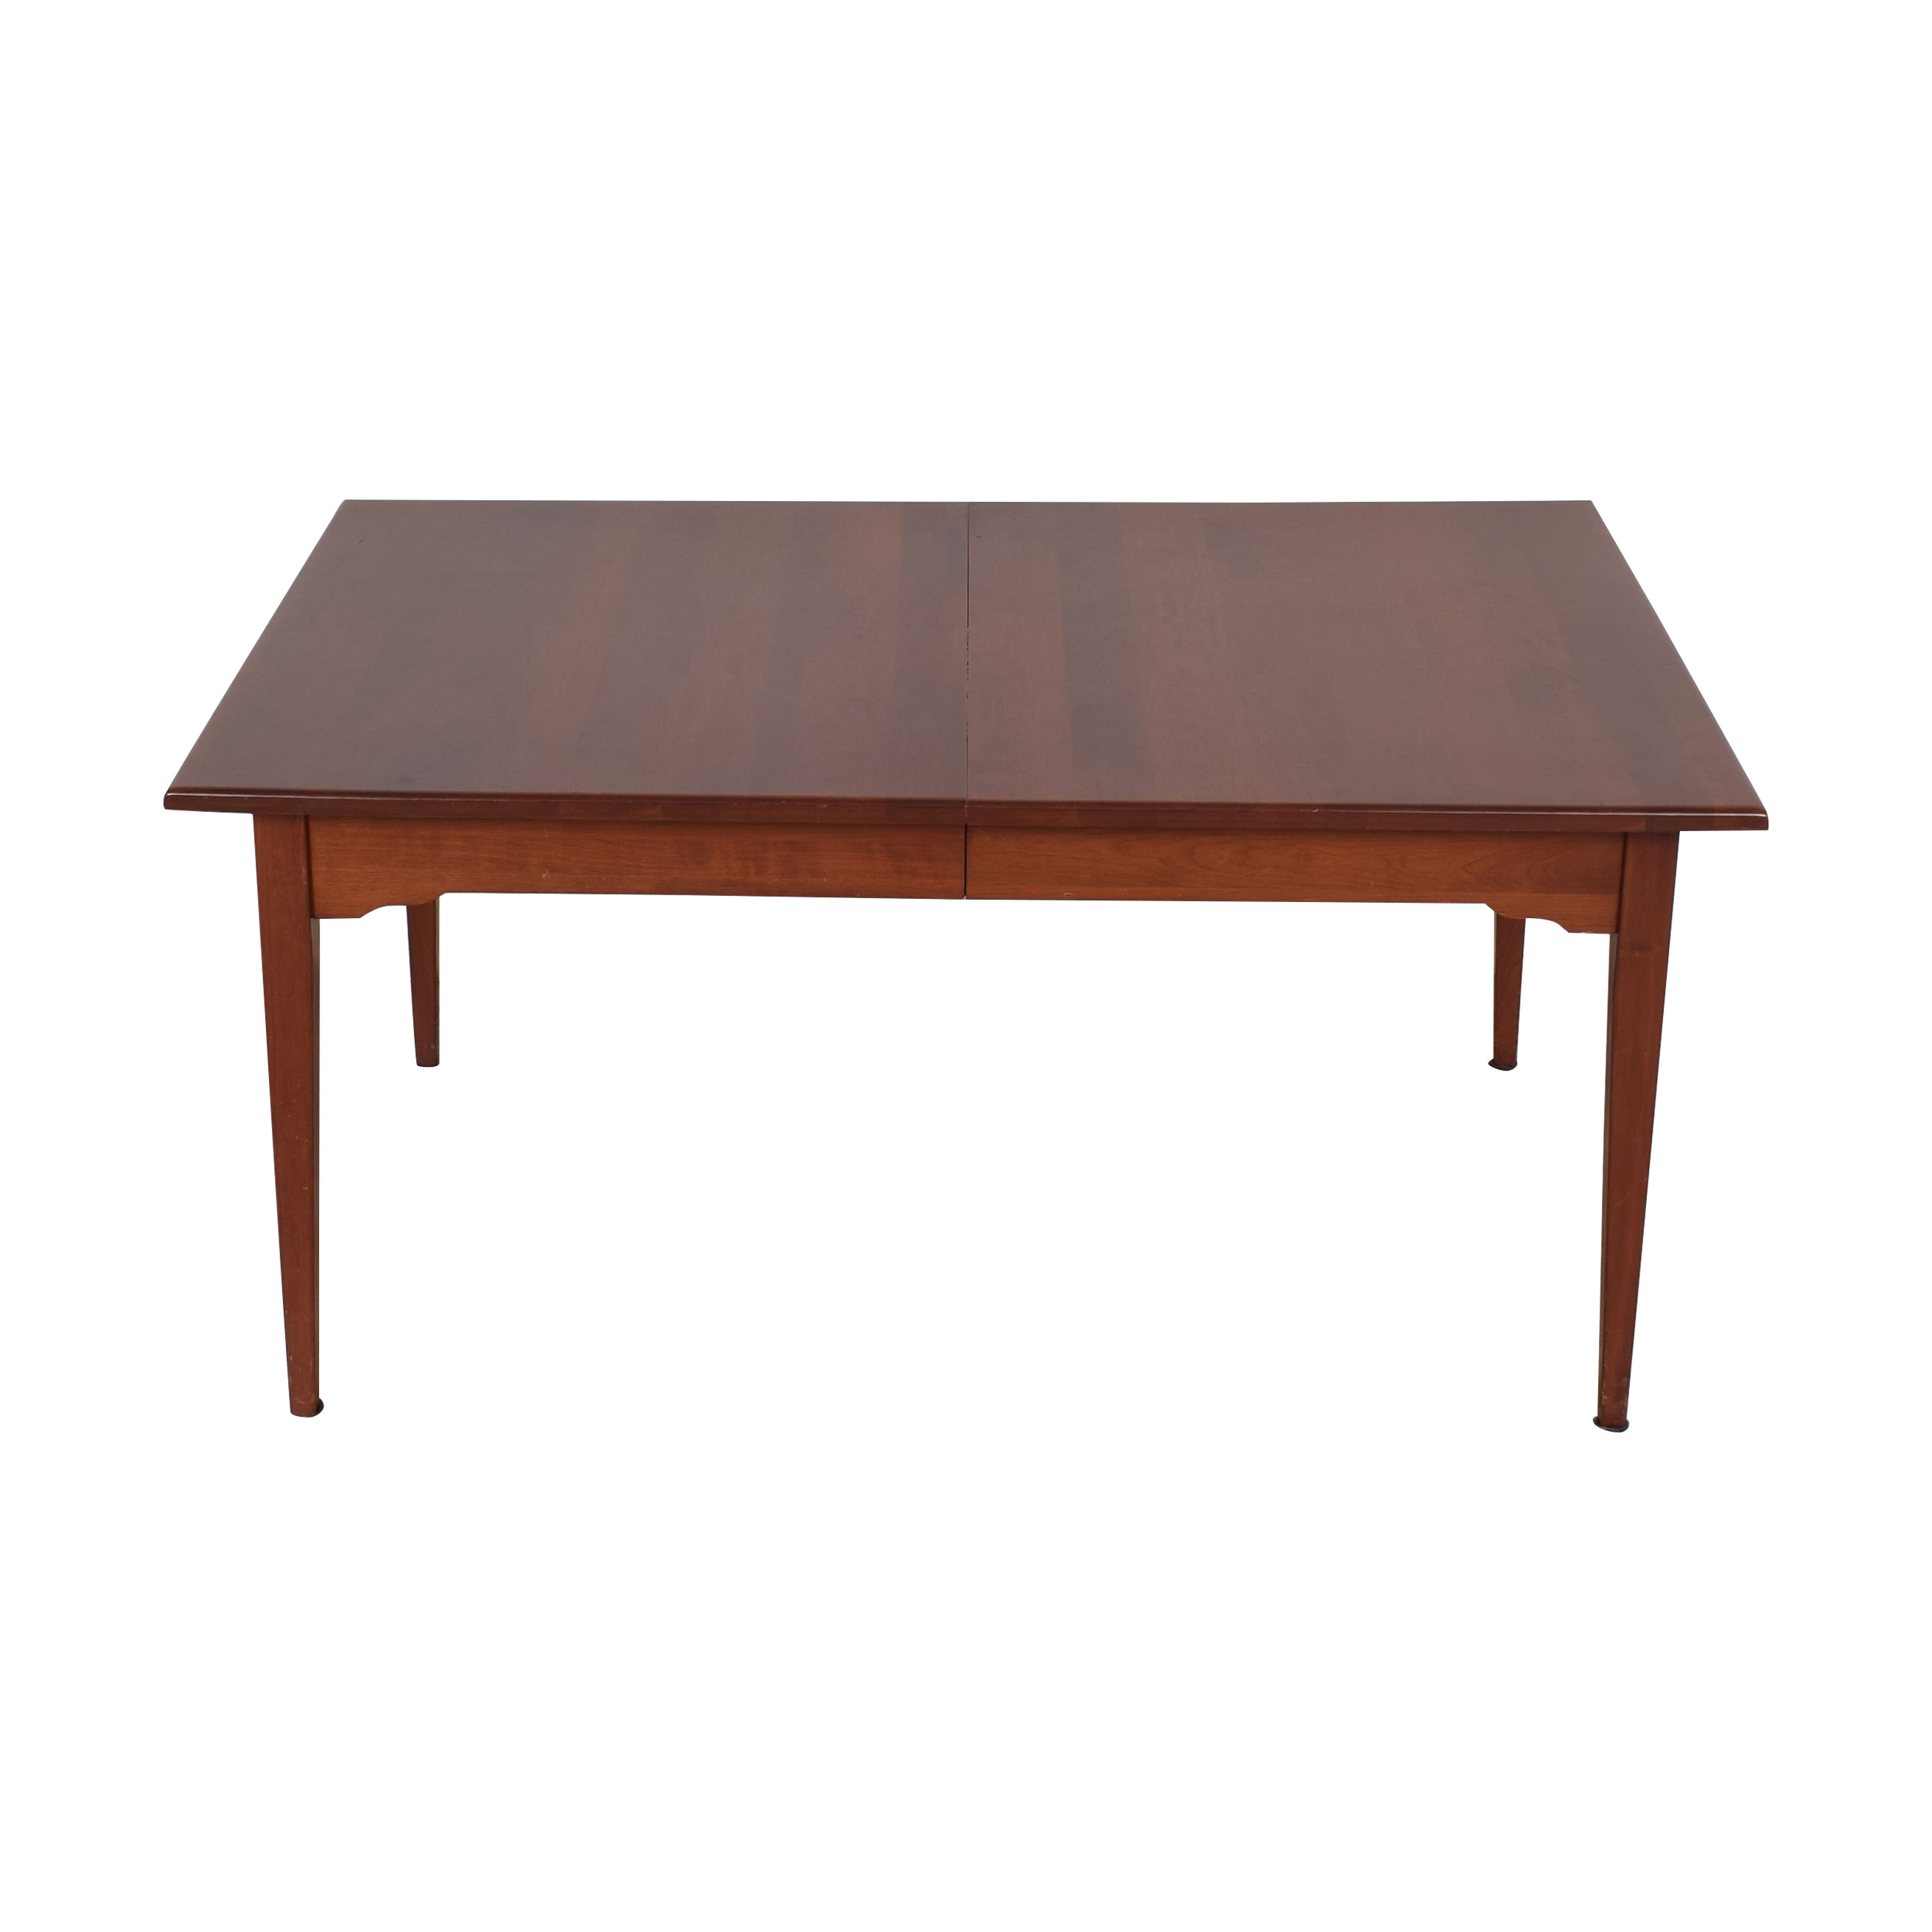 Vintage Dinner Table / Tables